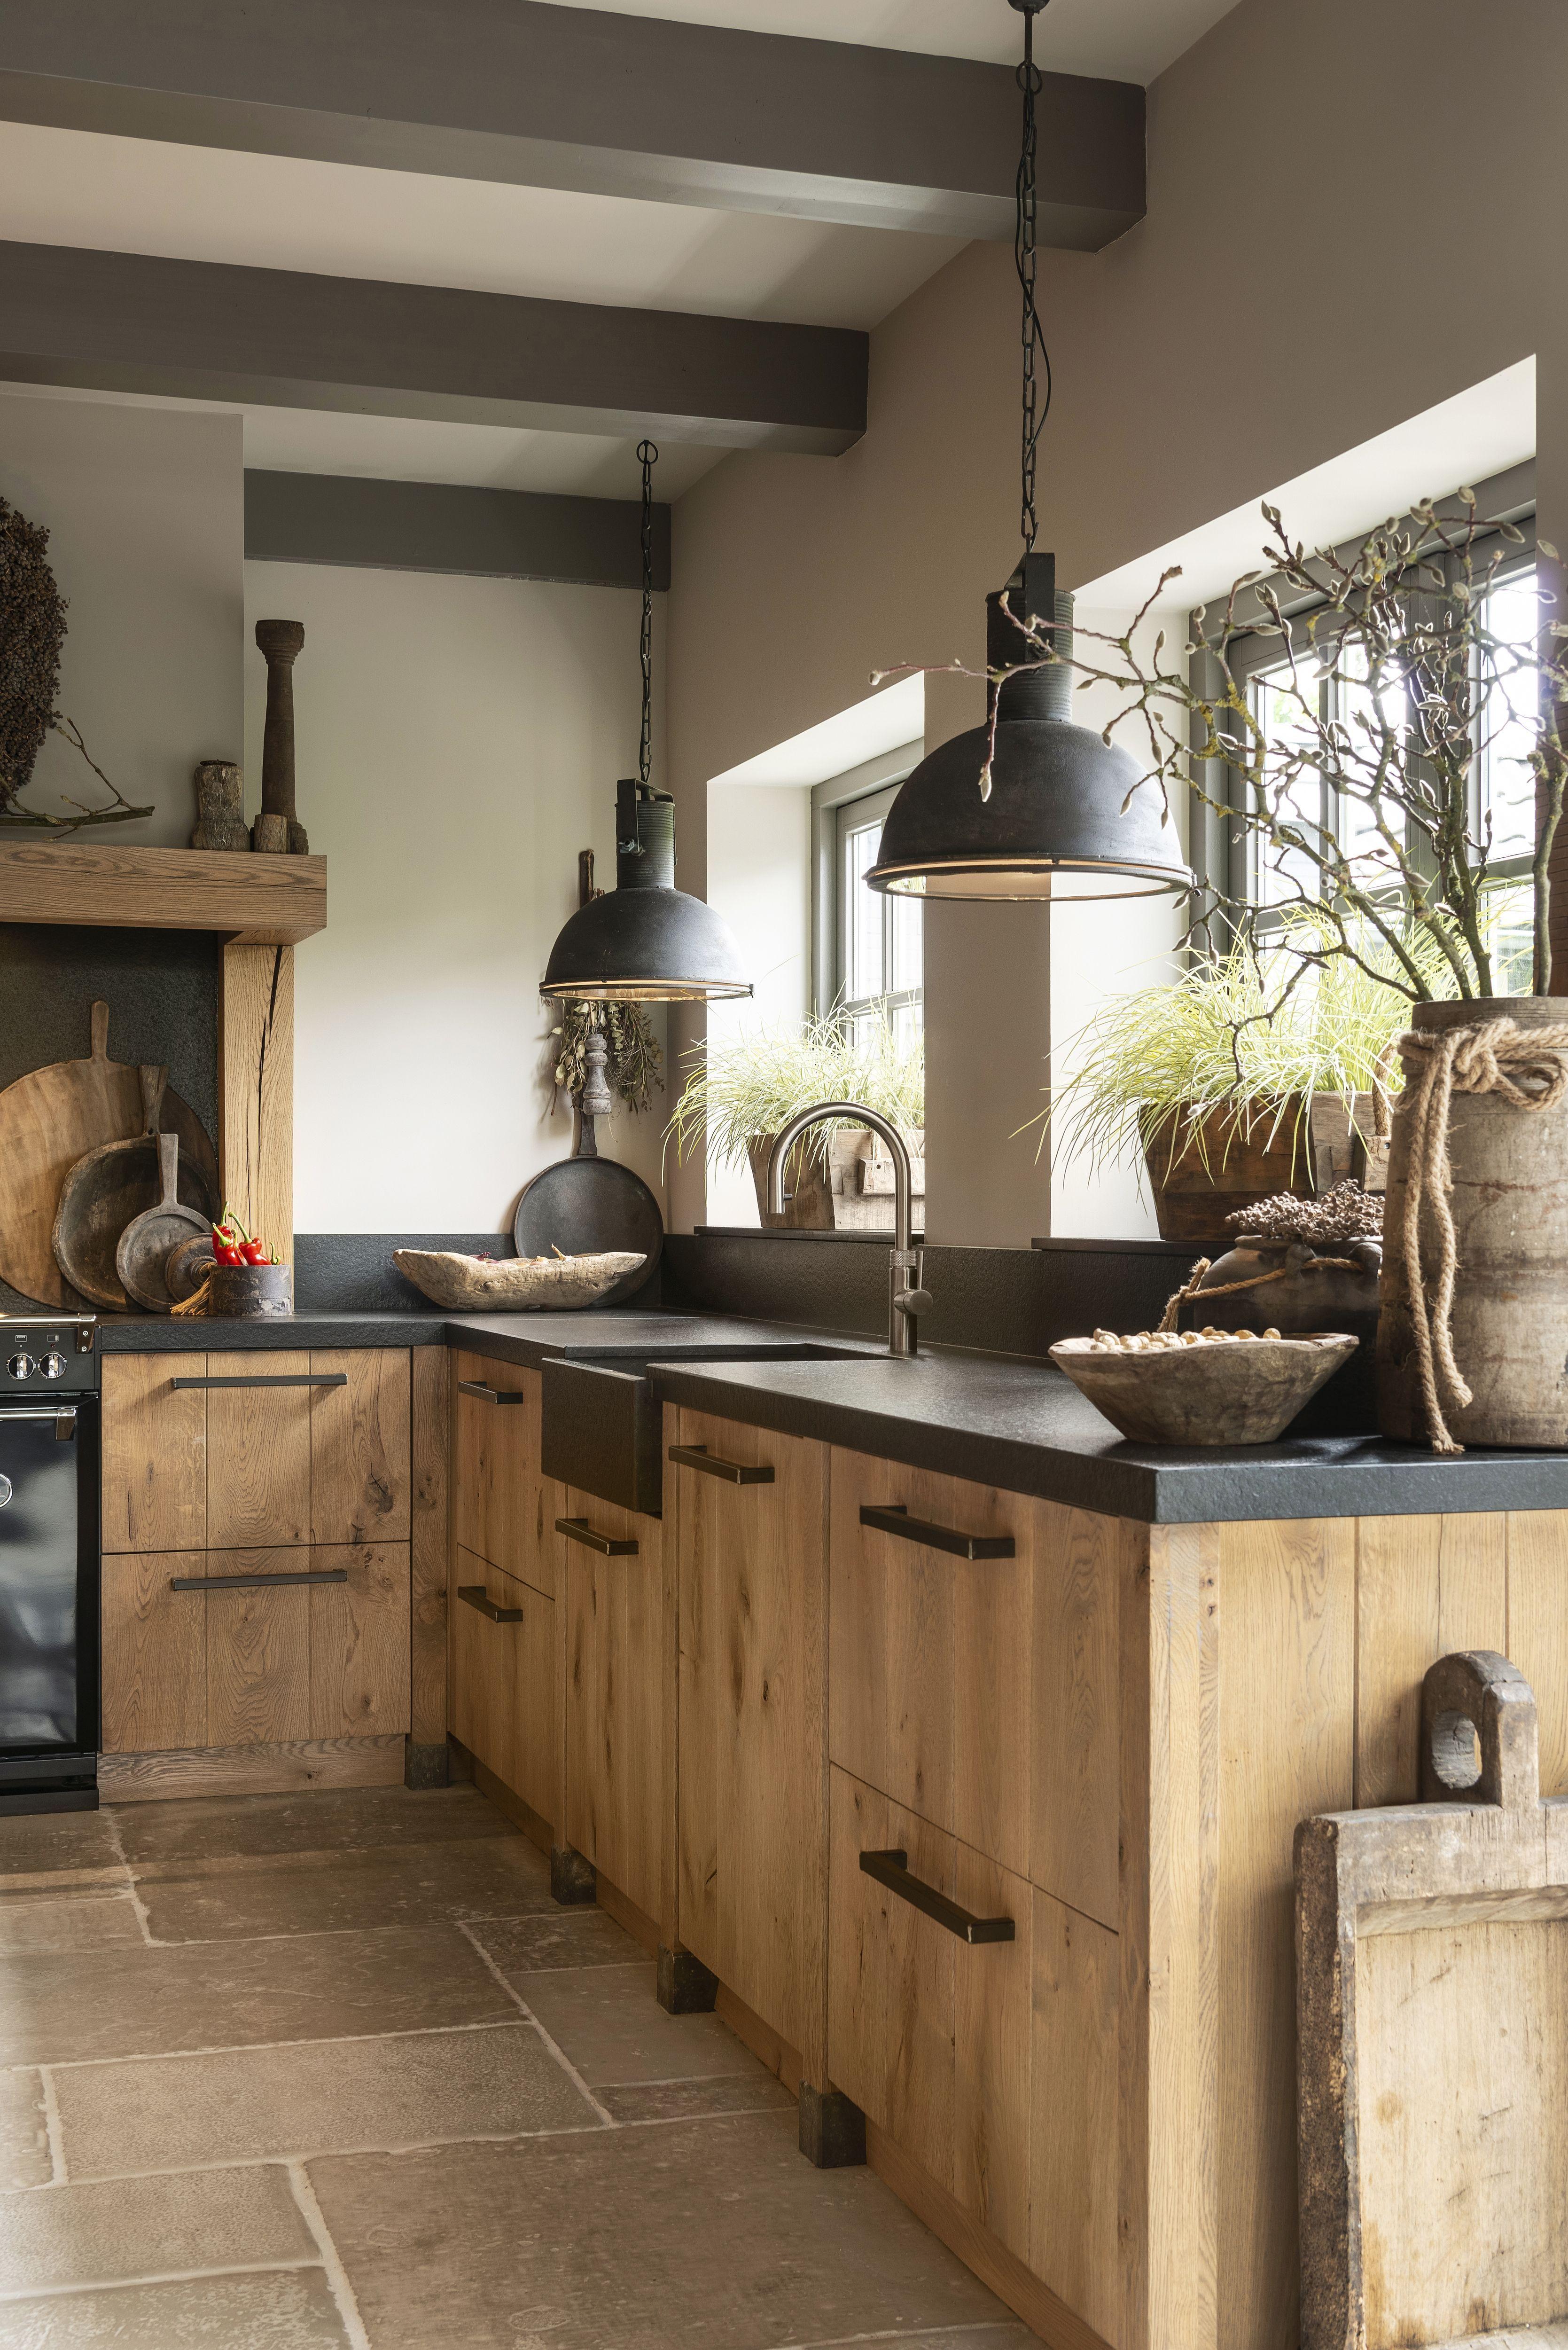 Top Image Kitchen Decor Pigs